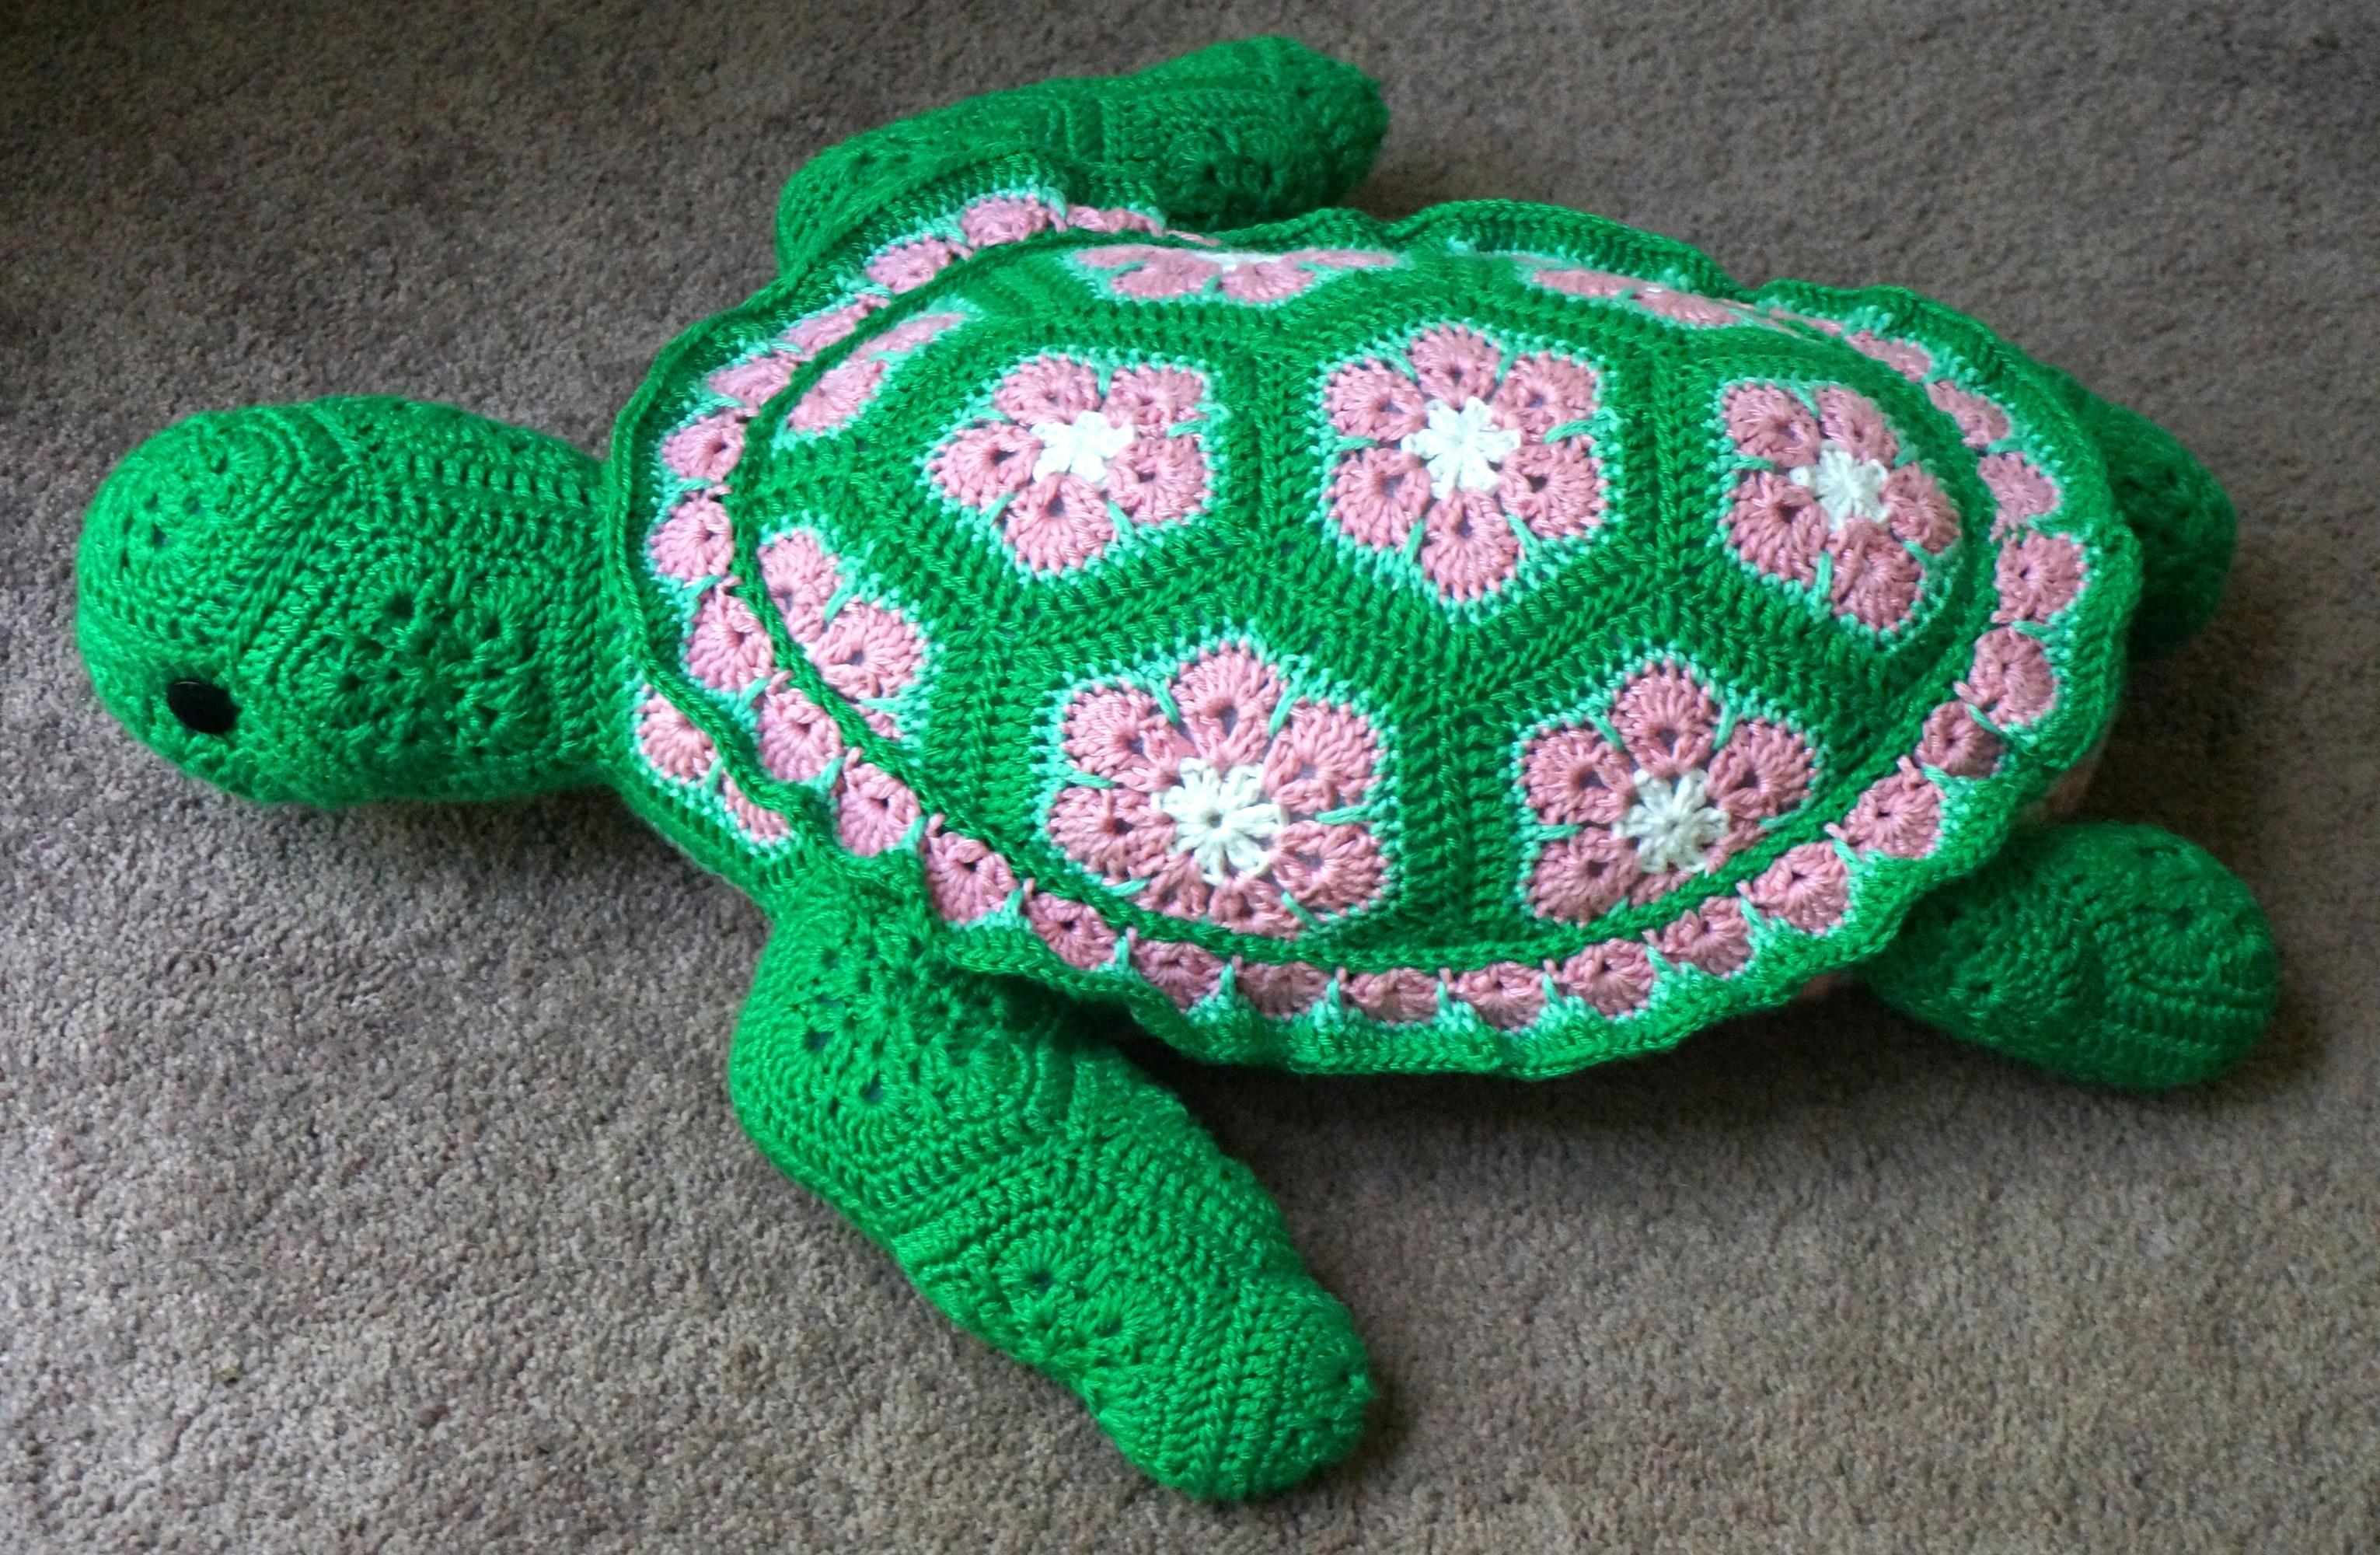 Fotos gratis : blanco, patrón, verde, tortuga marina, arte, reptil ...